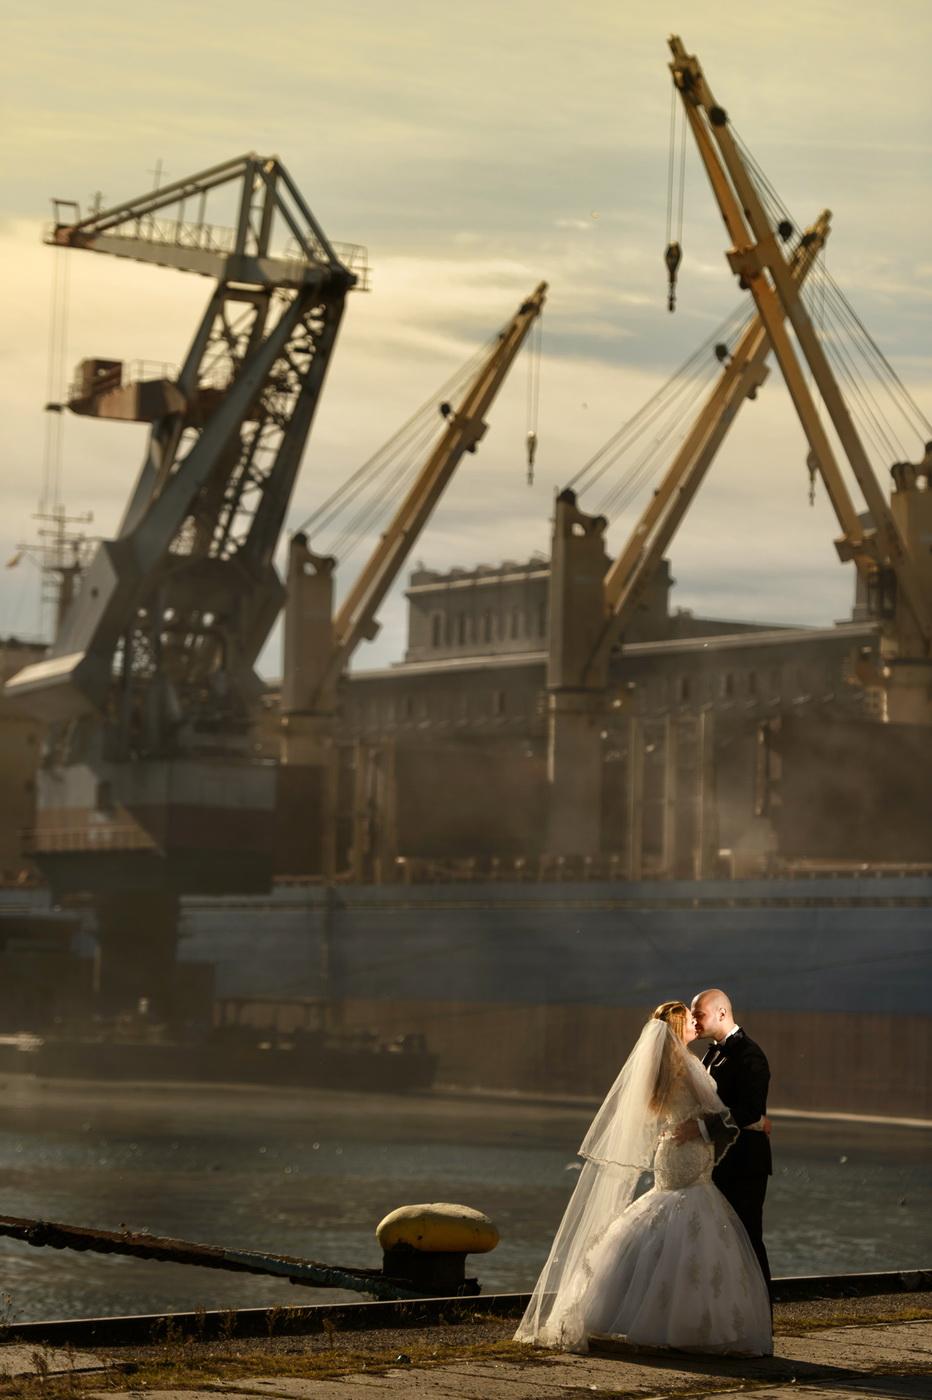 Destination Wedding Photographer_Marian Sterea_092.jpg